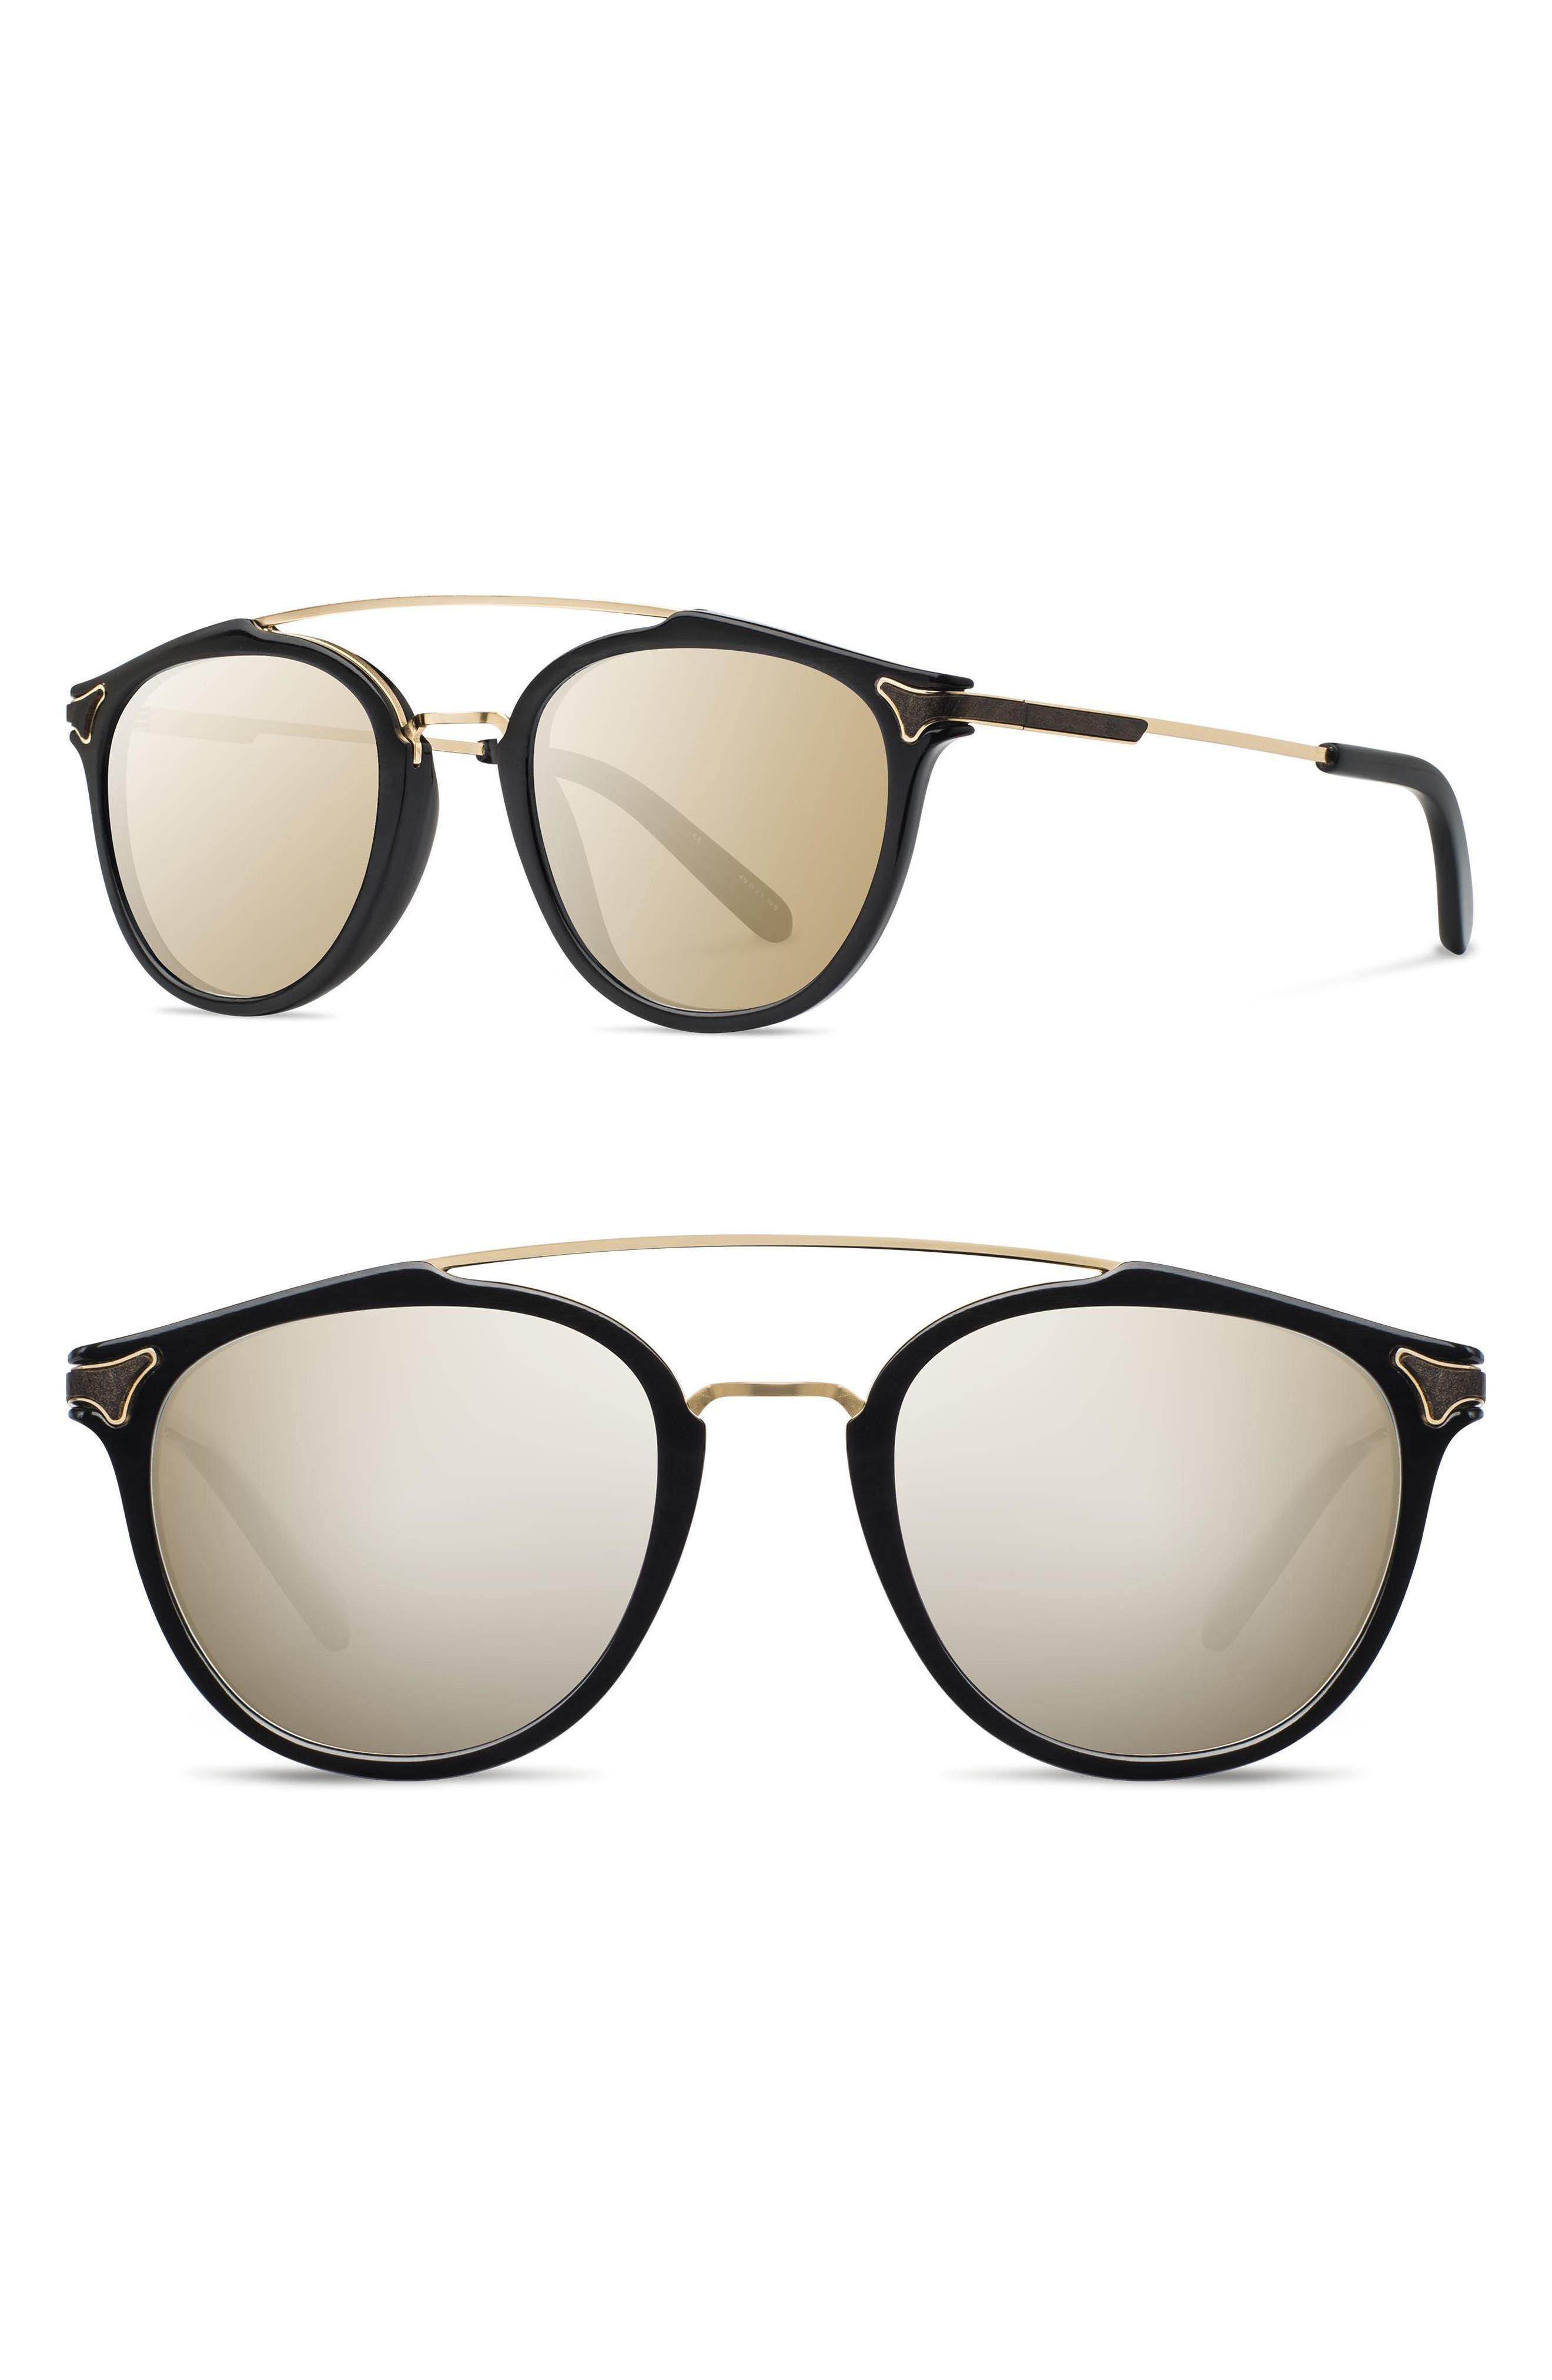 Shwood Kinsrow 49mm Acetate & Wood Sunglasses